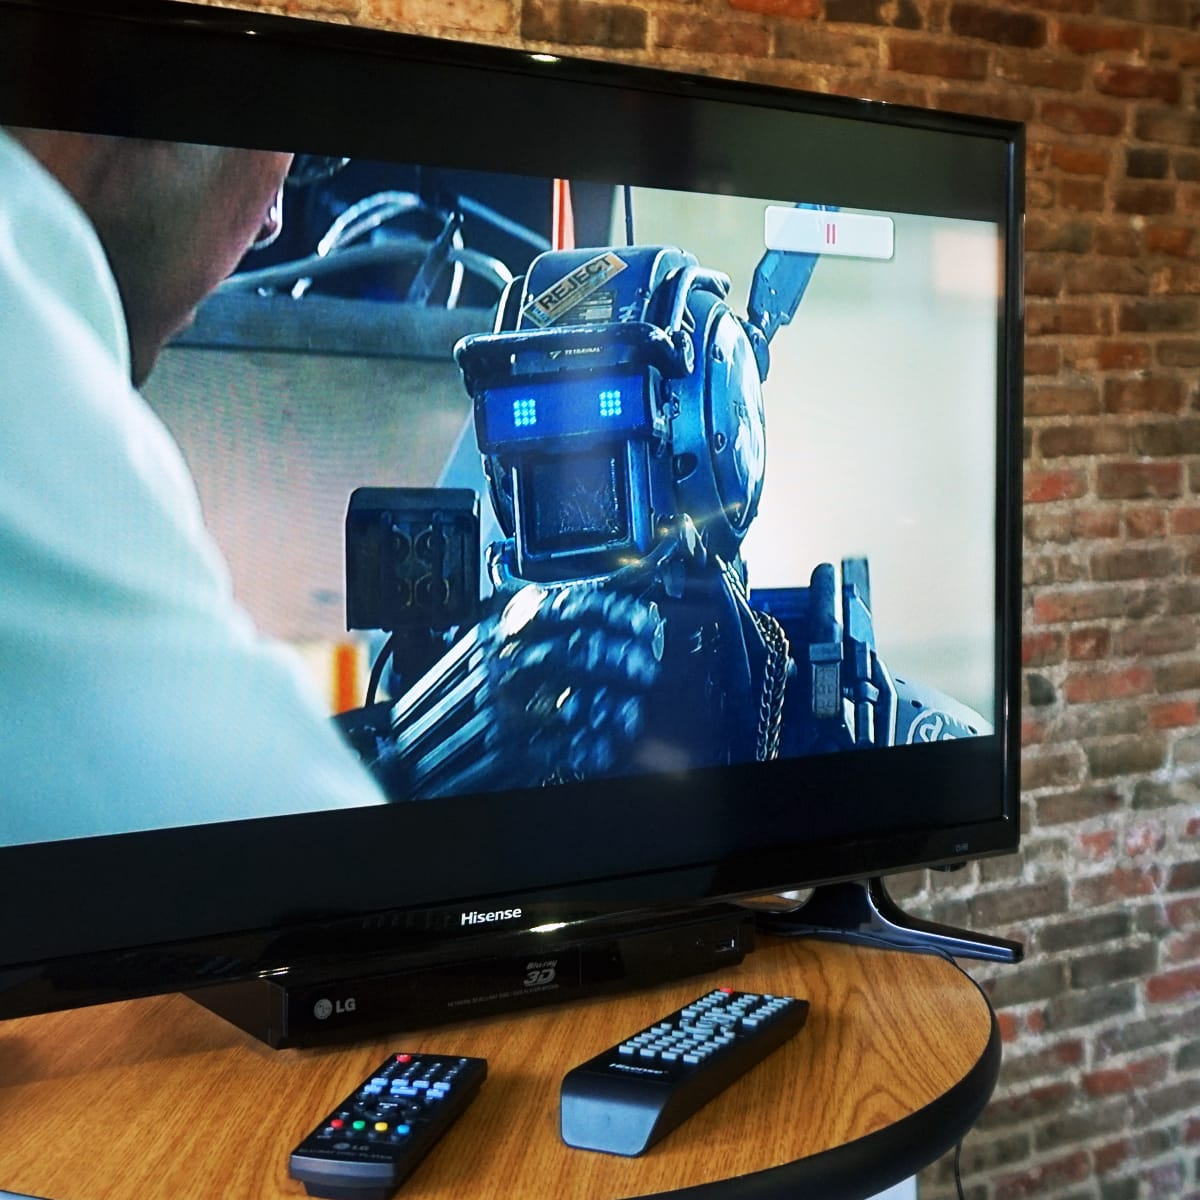 Hisense H3 Series LED TV Review - Reviewed Televisions